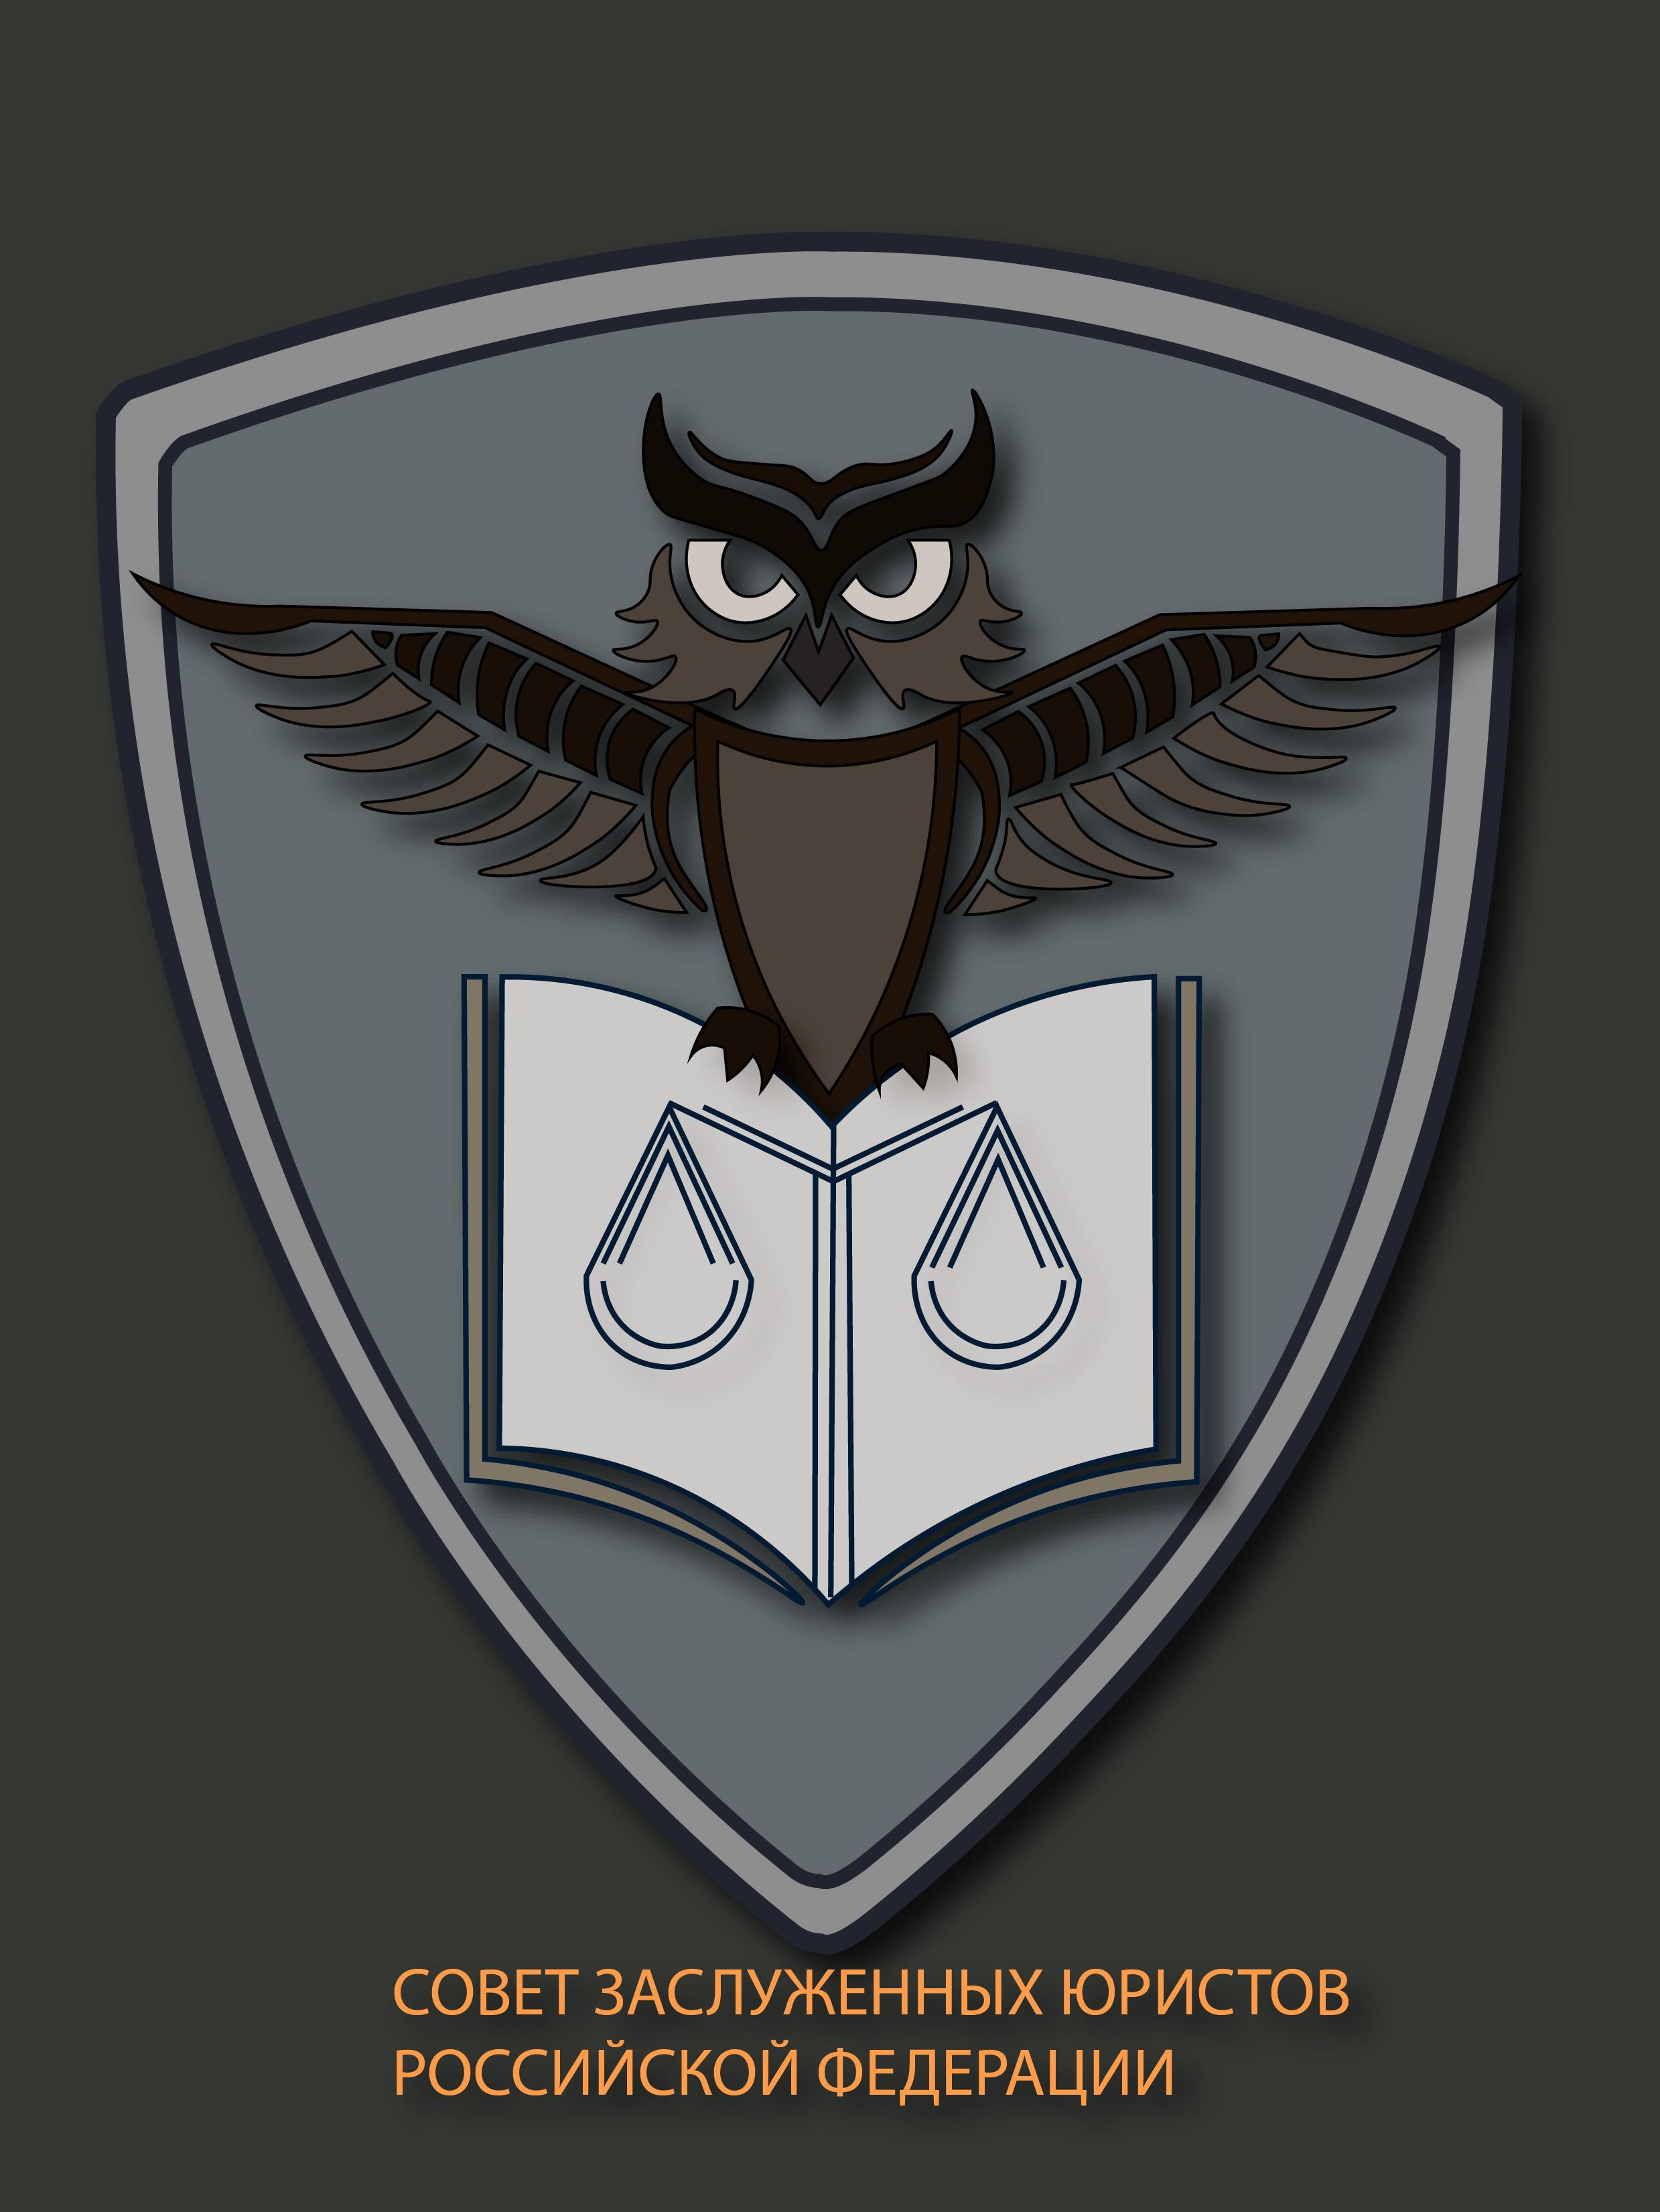 Разработка логотипа Совета (Клуба) заслуженных юристов Российской Федерации фото f_0805e49882c562f1.jpg